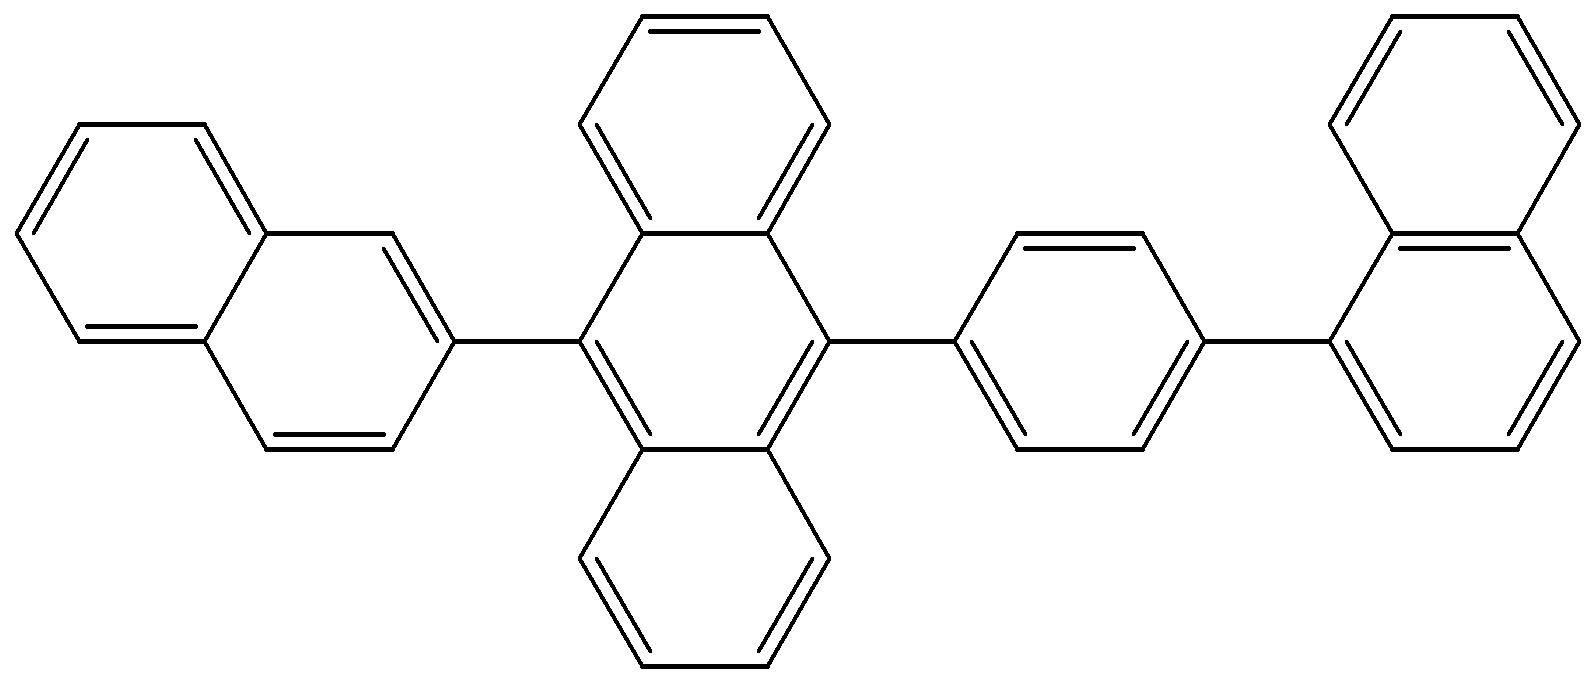 Figure 112005017102381-pat00013